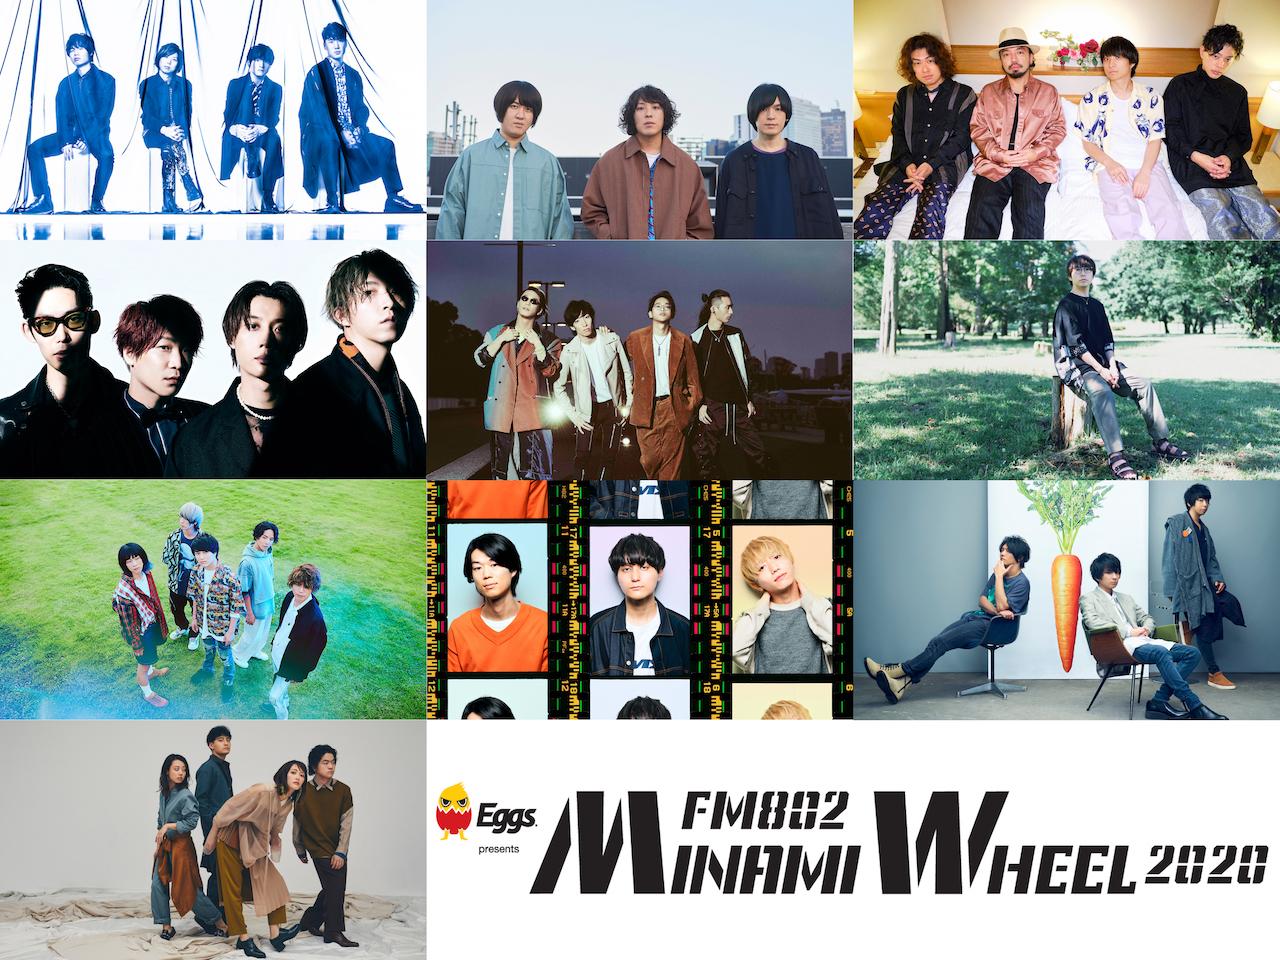 『FM802 MINAMI WHEEL』